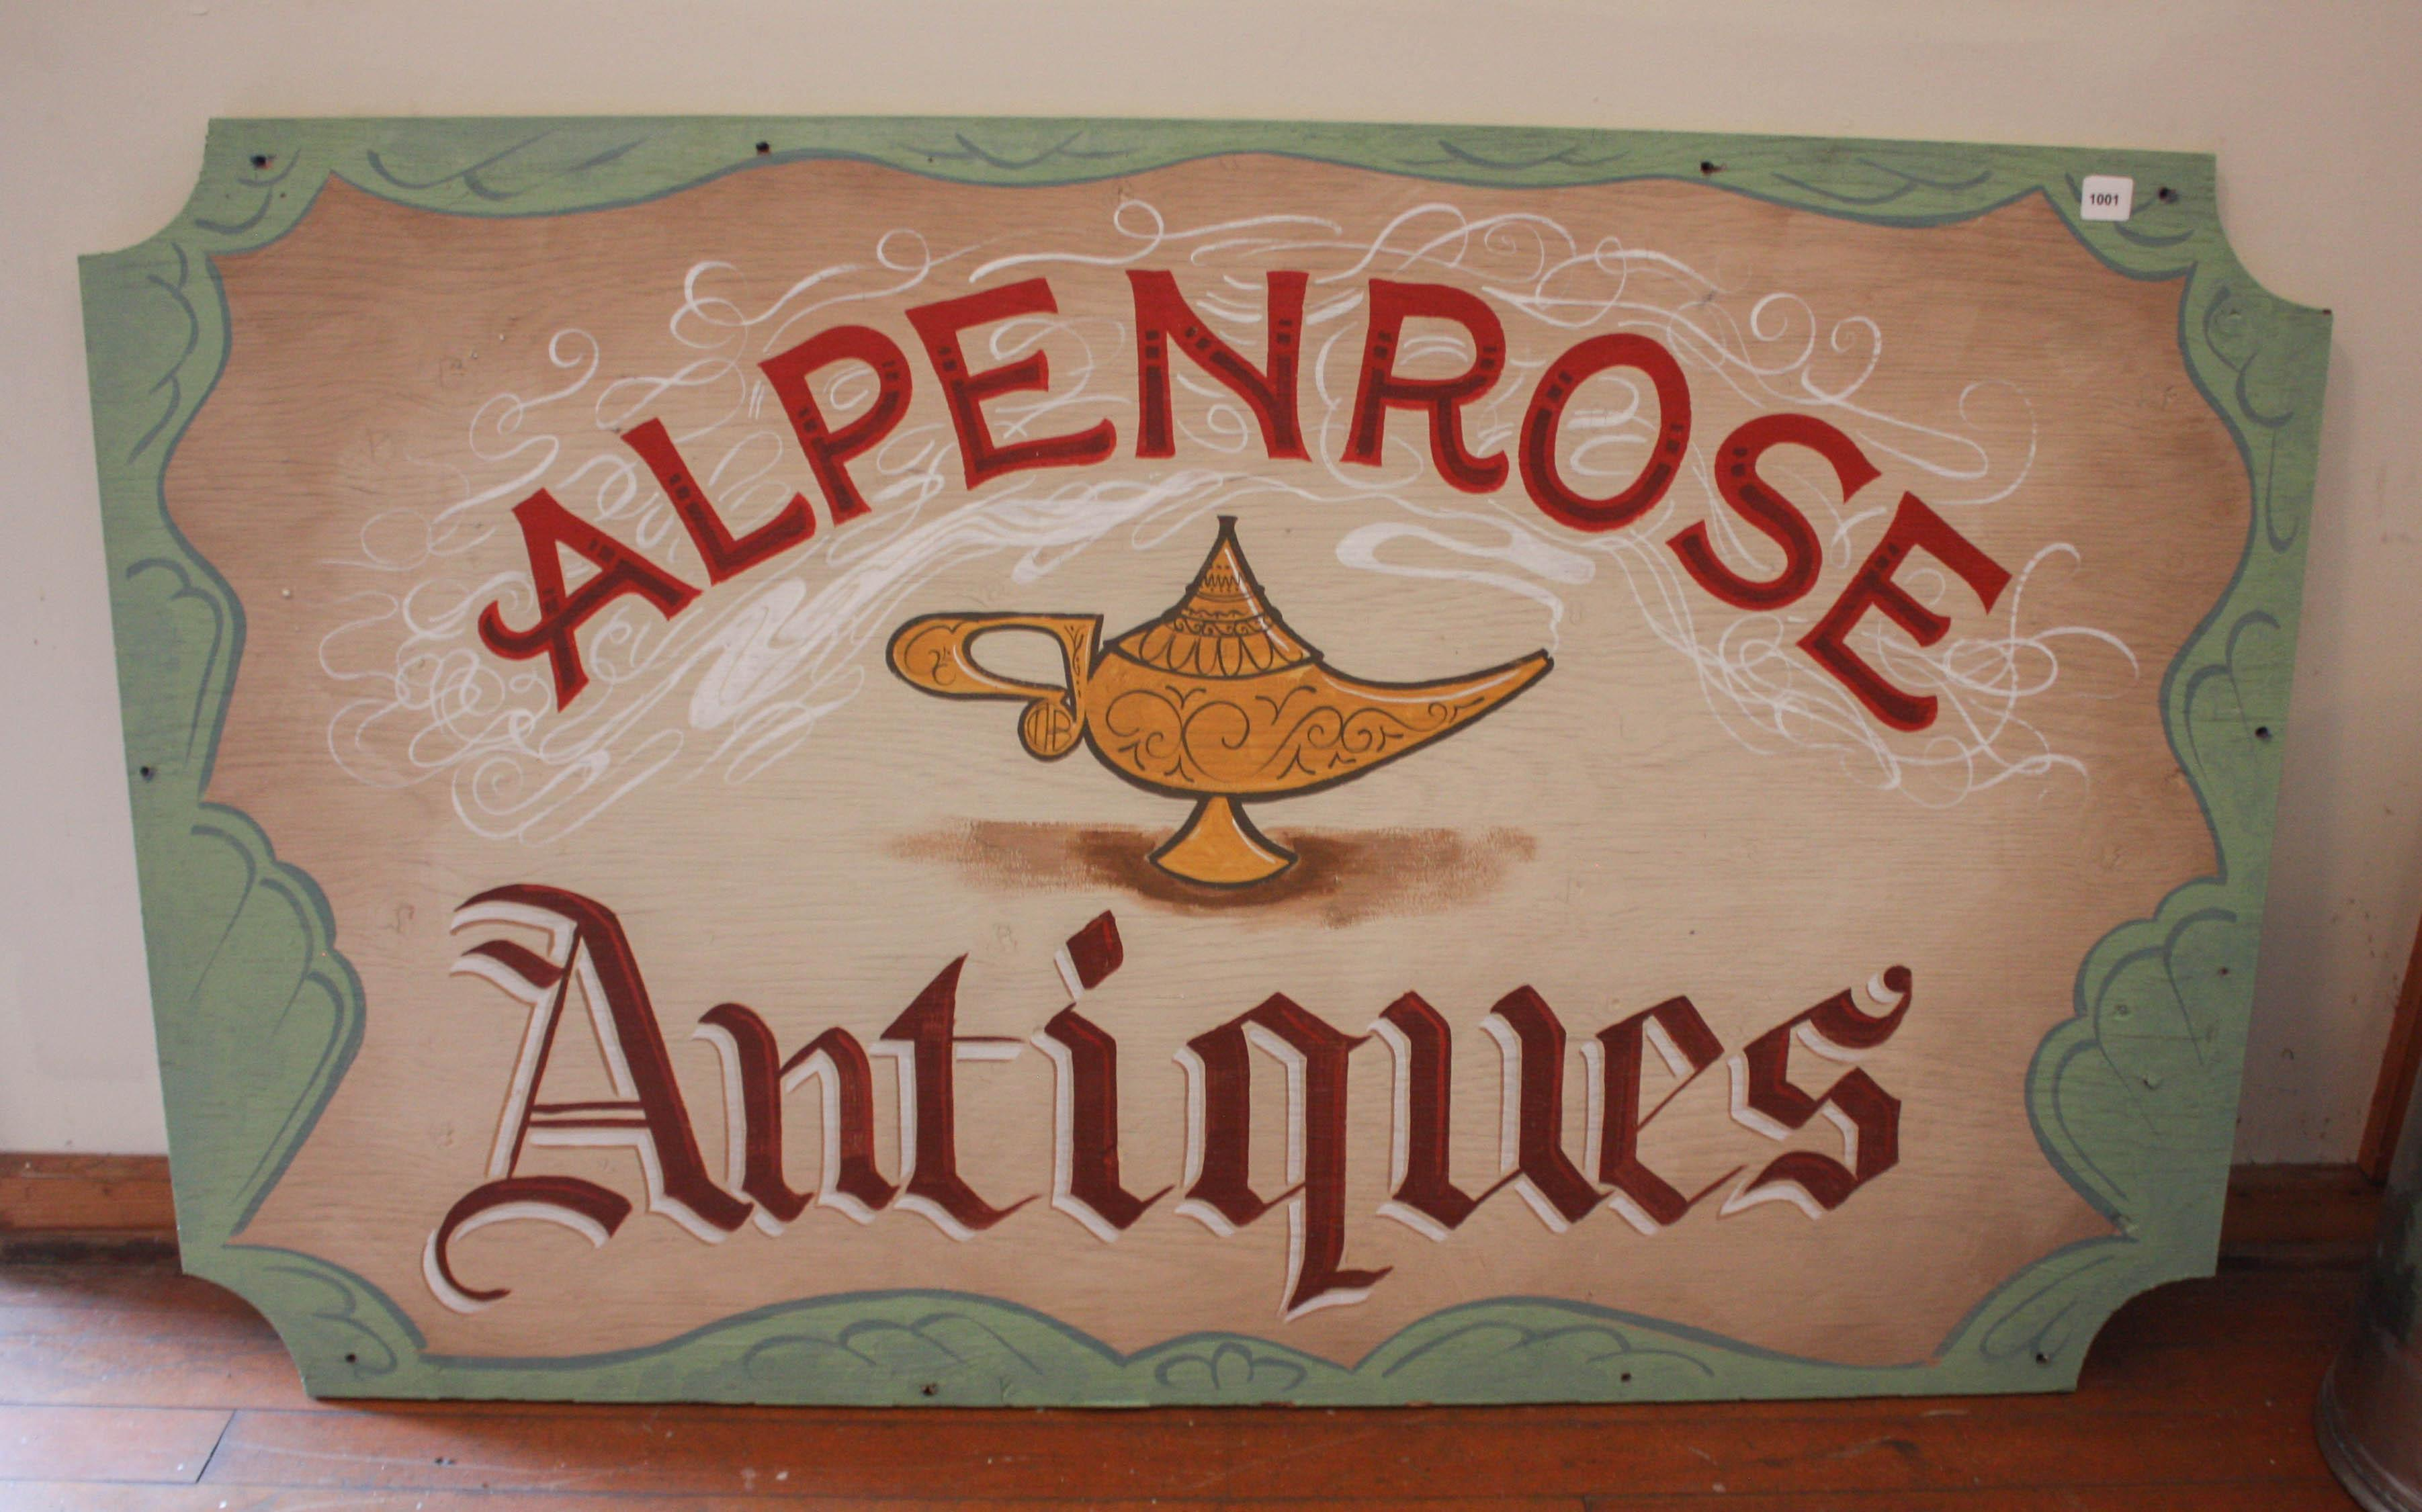 ALPENROSE ANTIQUES' SIGN